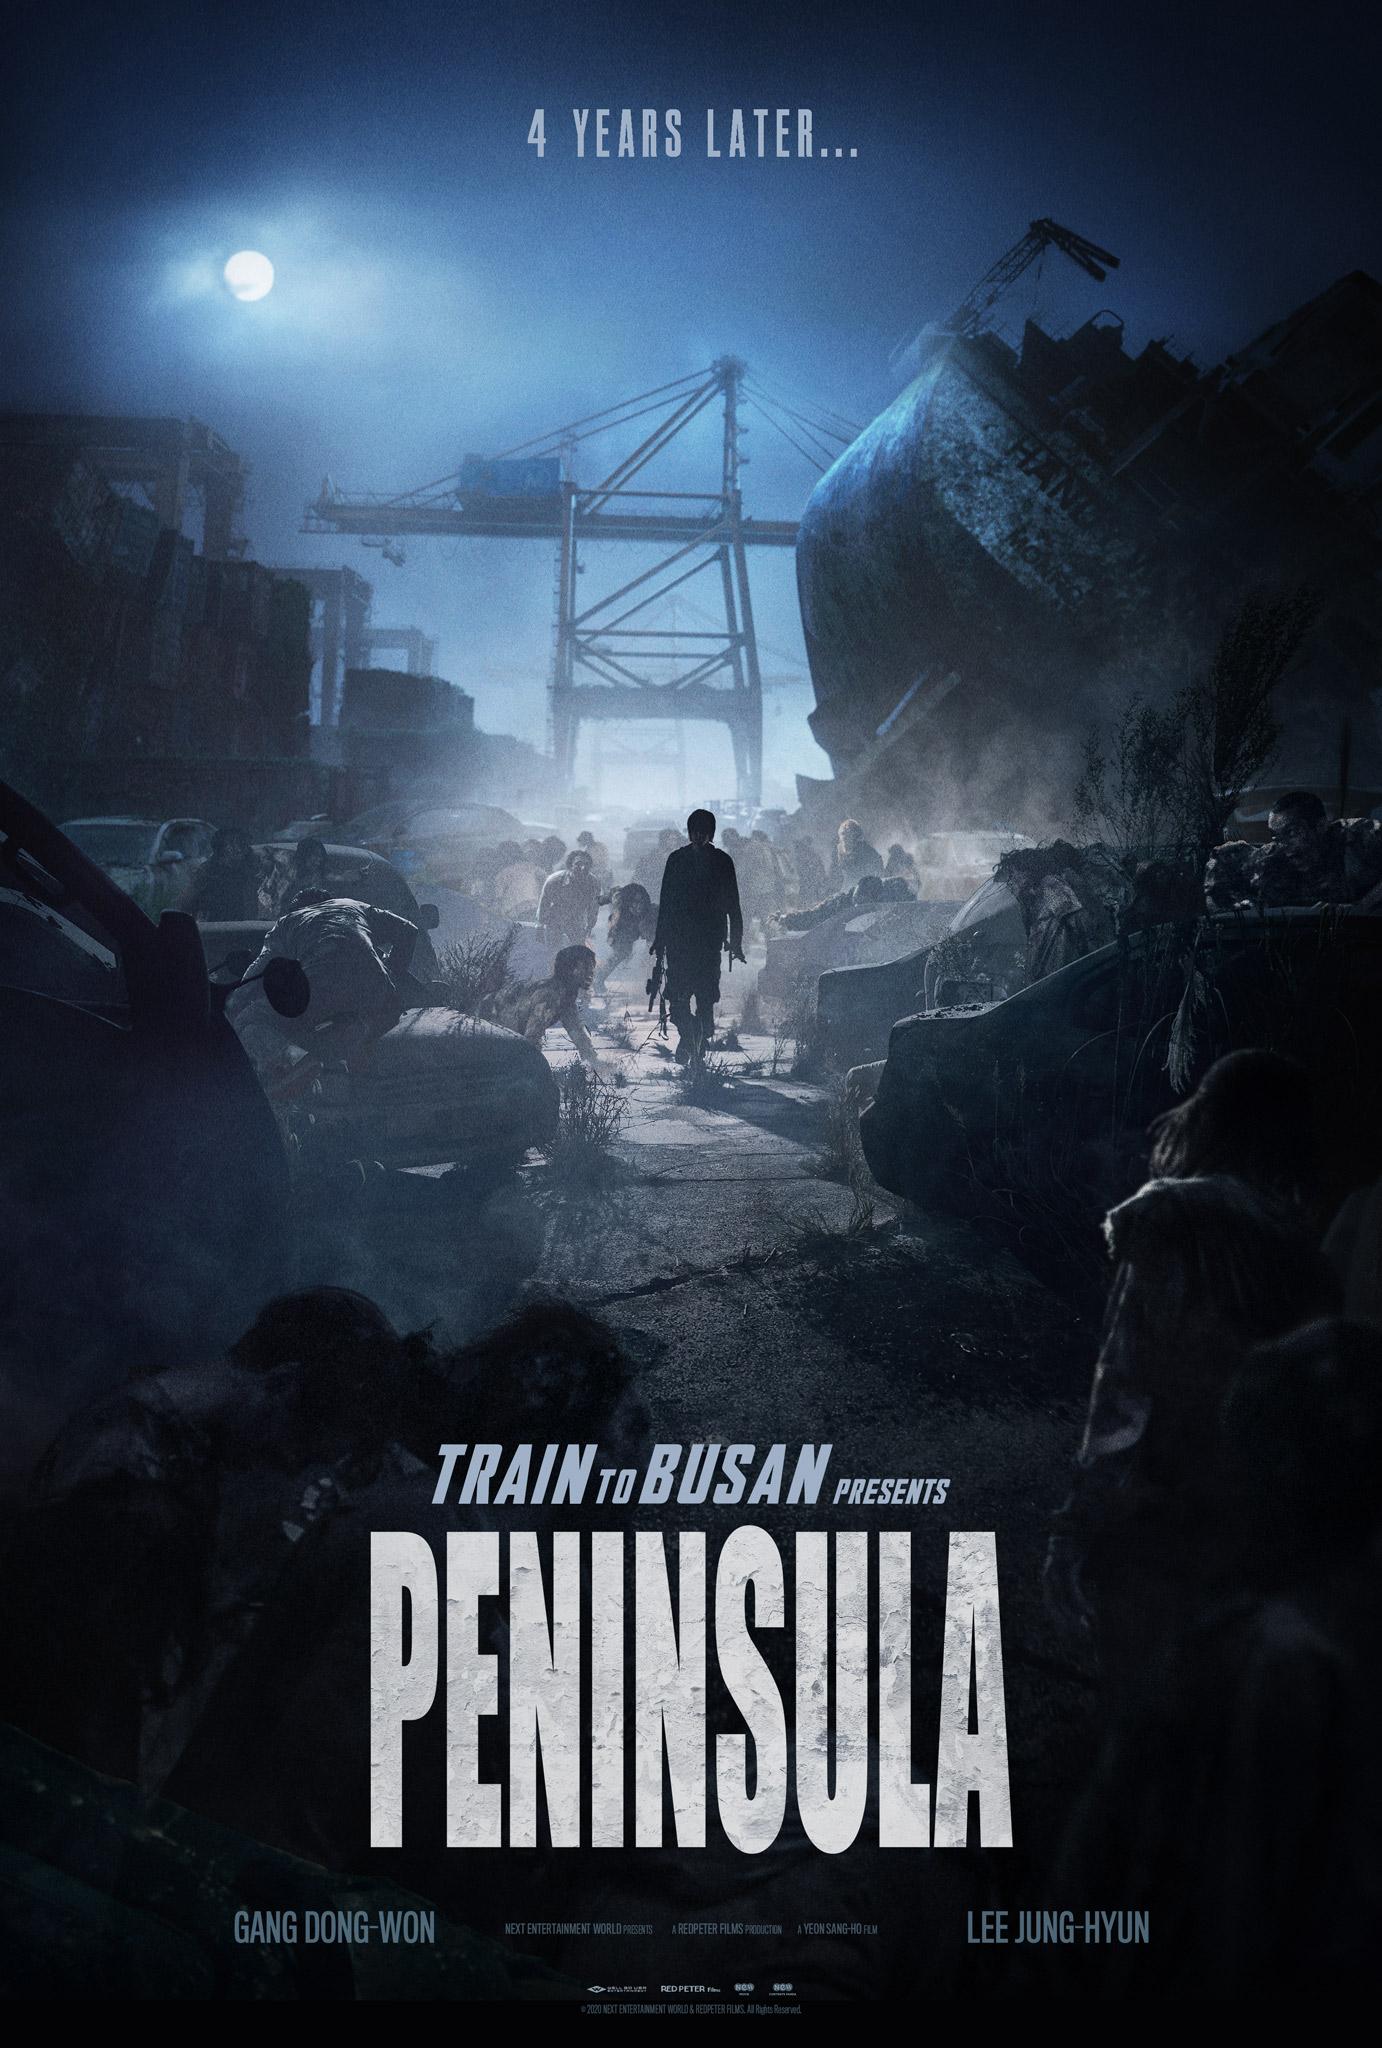 Train to Busan 2 Peninsula Poster